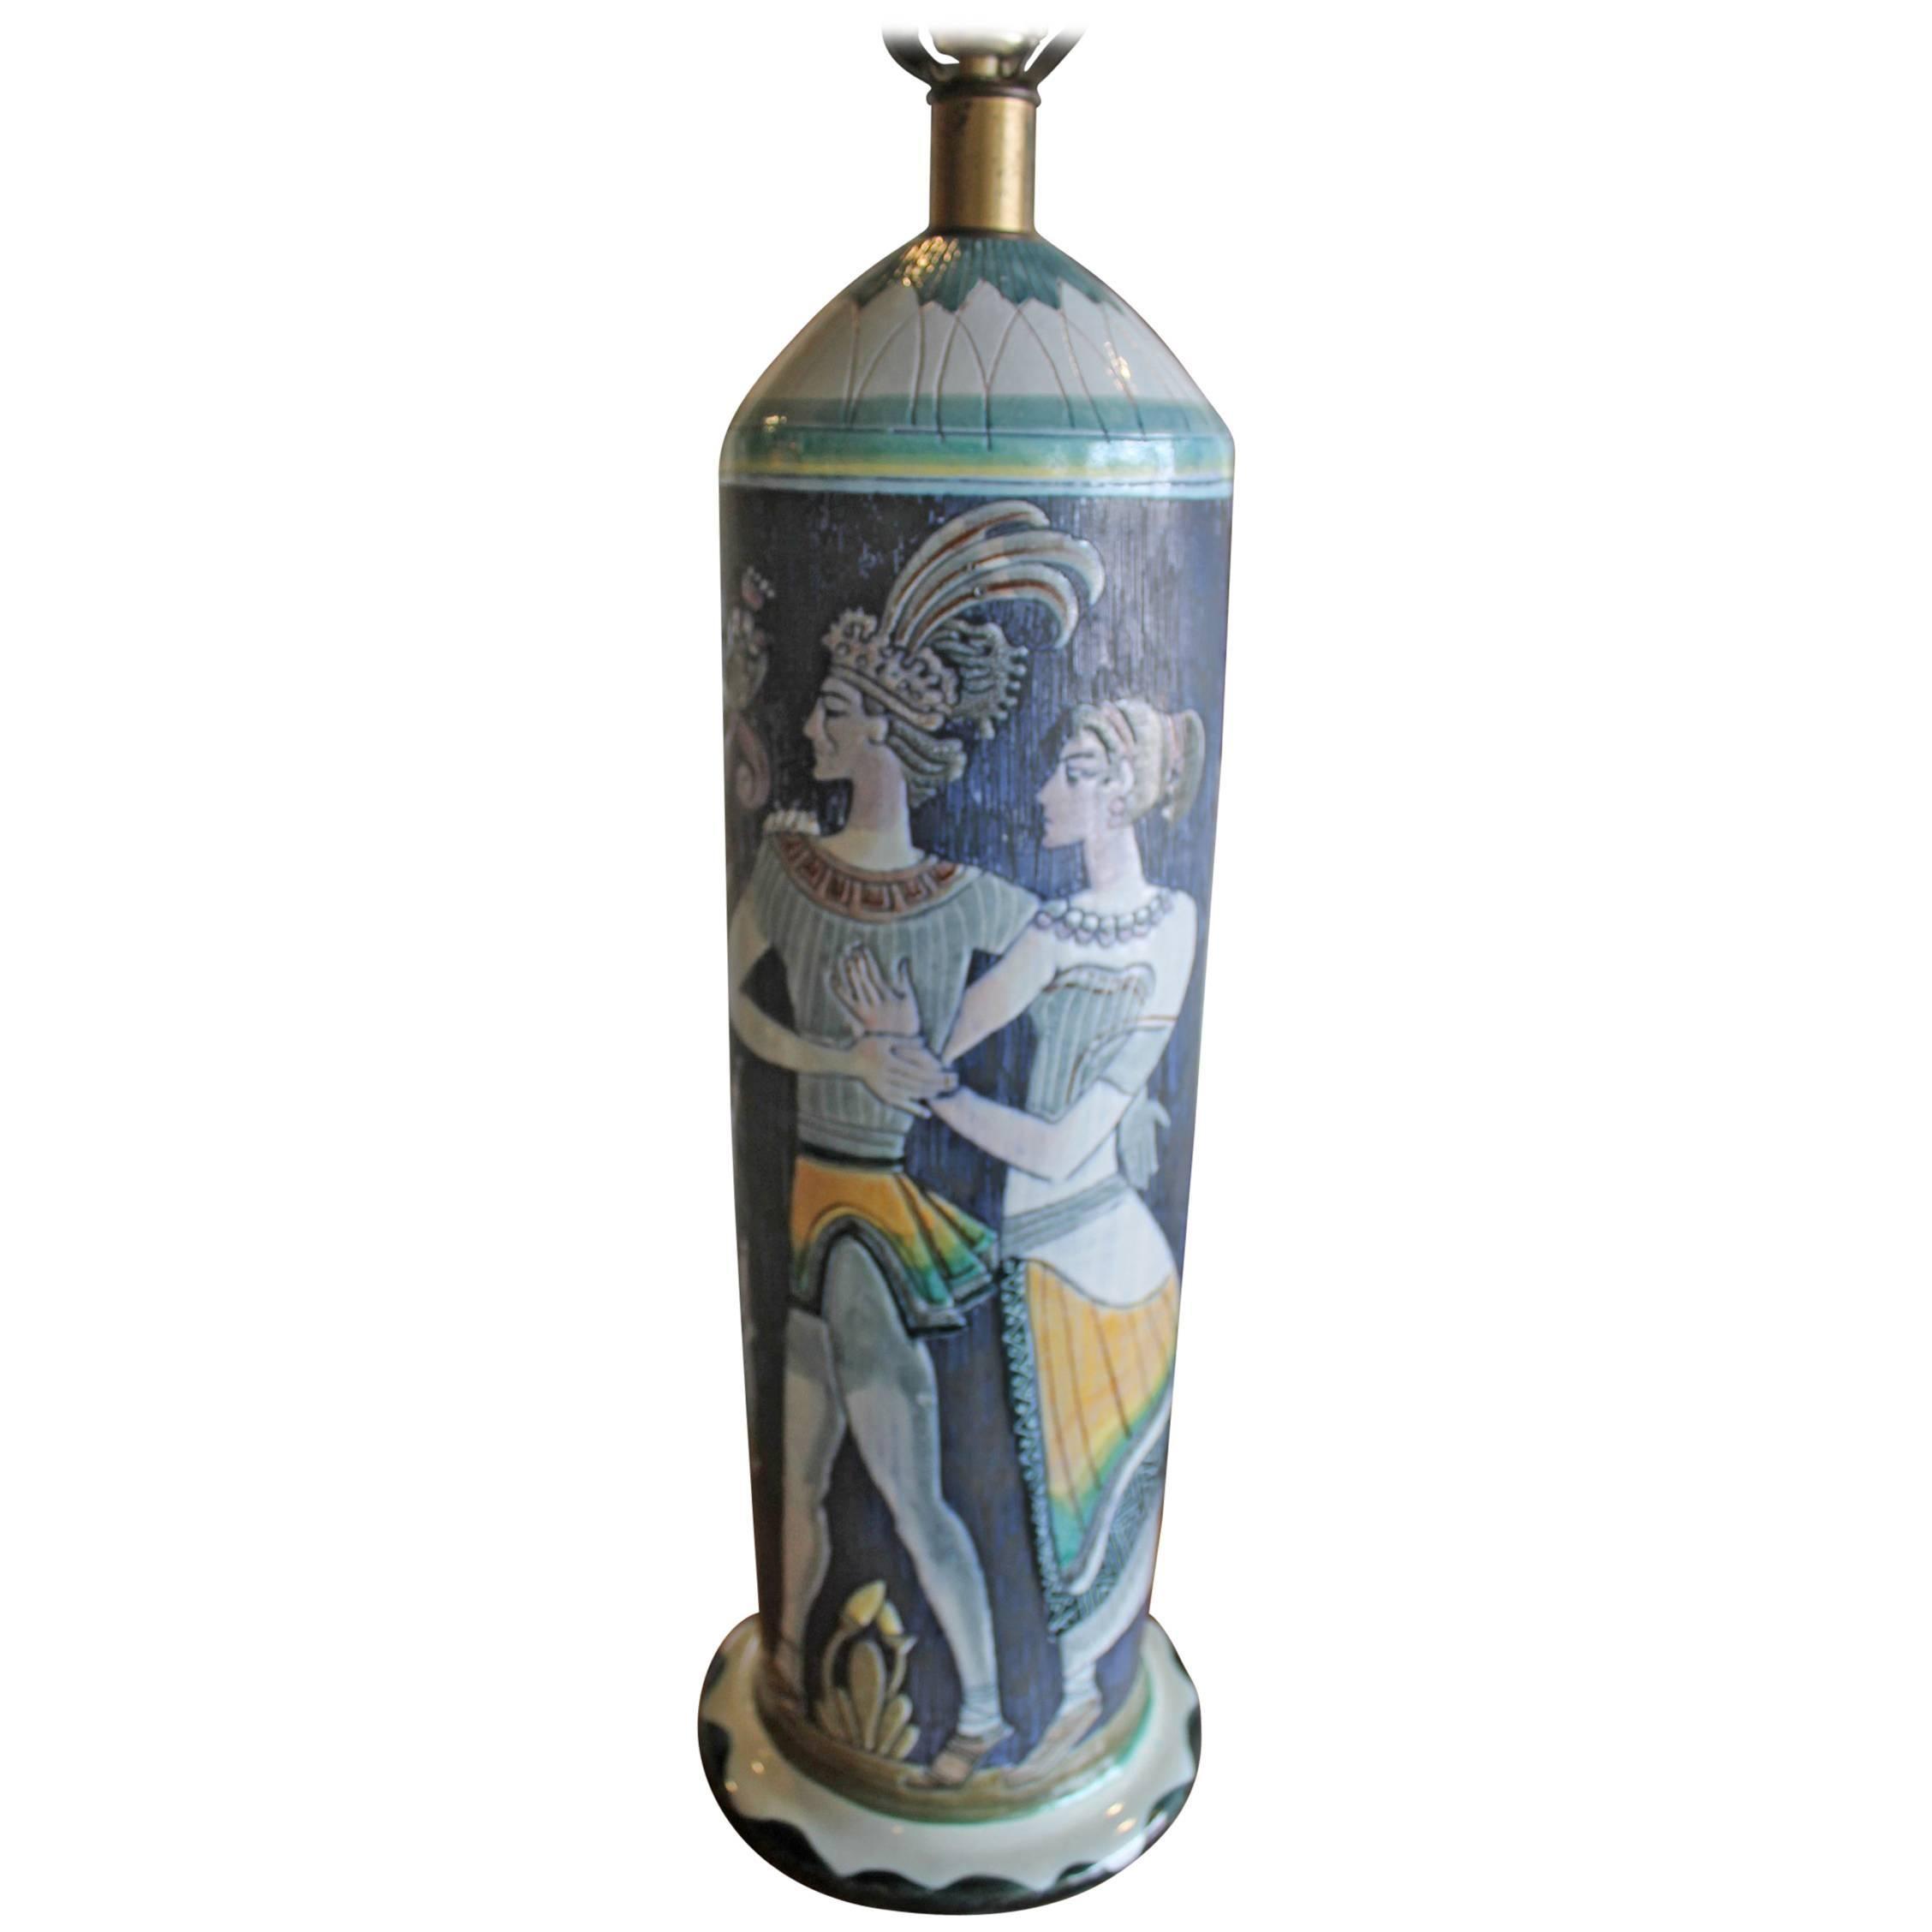 Marian Zawadsky for Tilgman Keramik Vintage Sweden Table Lamp Mid-Century Modern